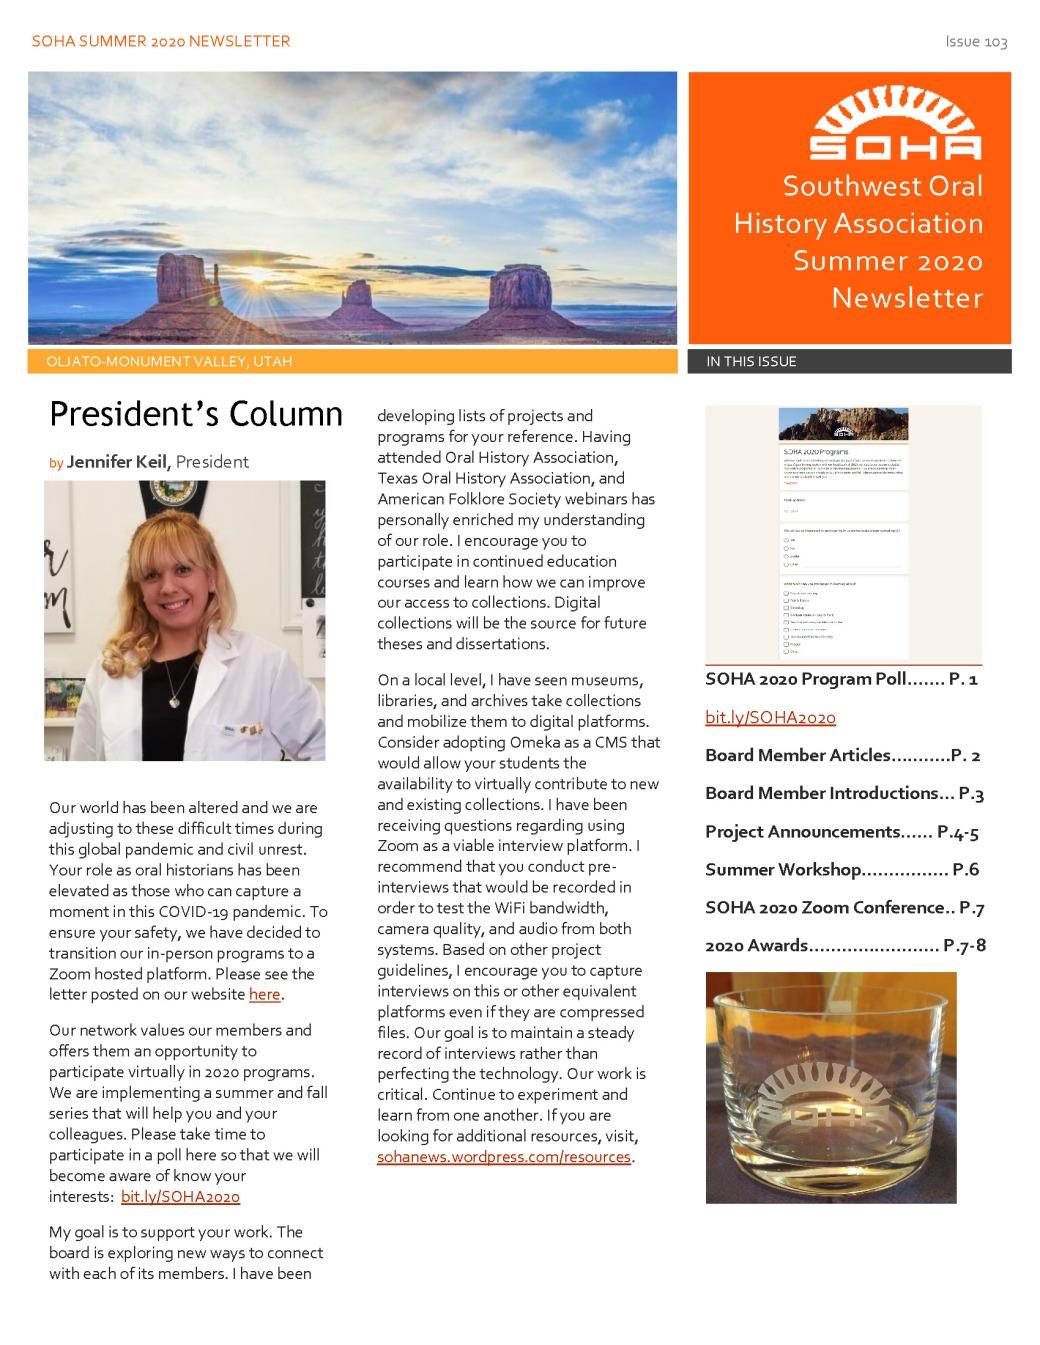 SOHA Summer 2020 Newsletter_FINAL_Page_01